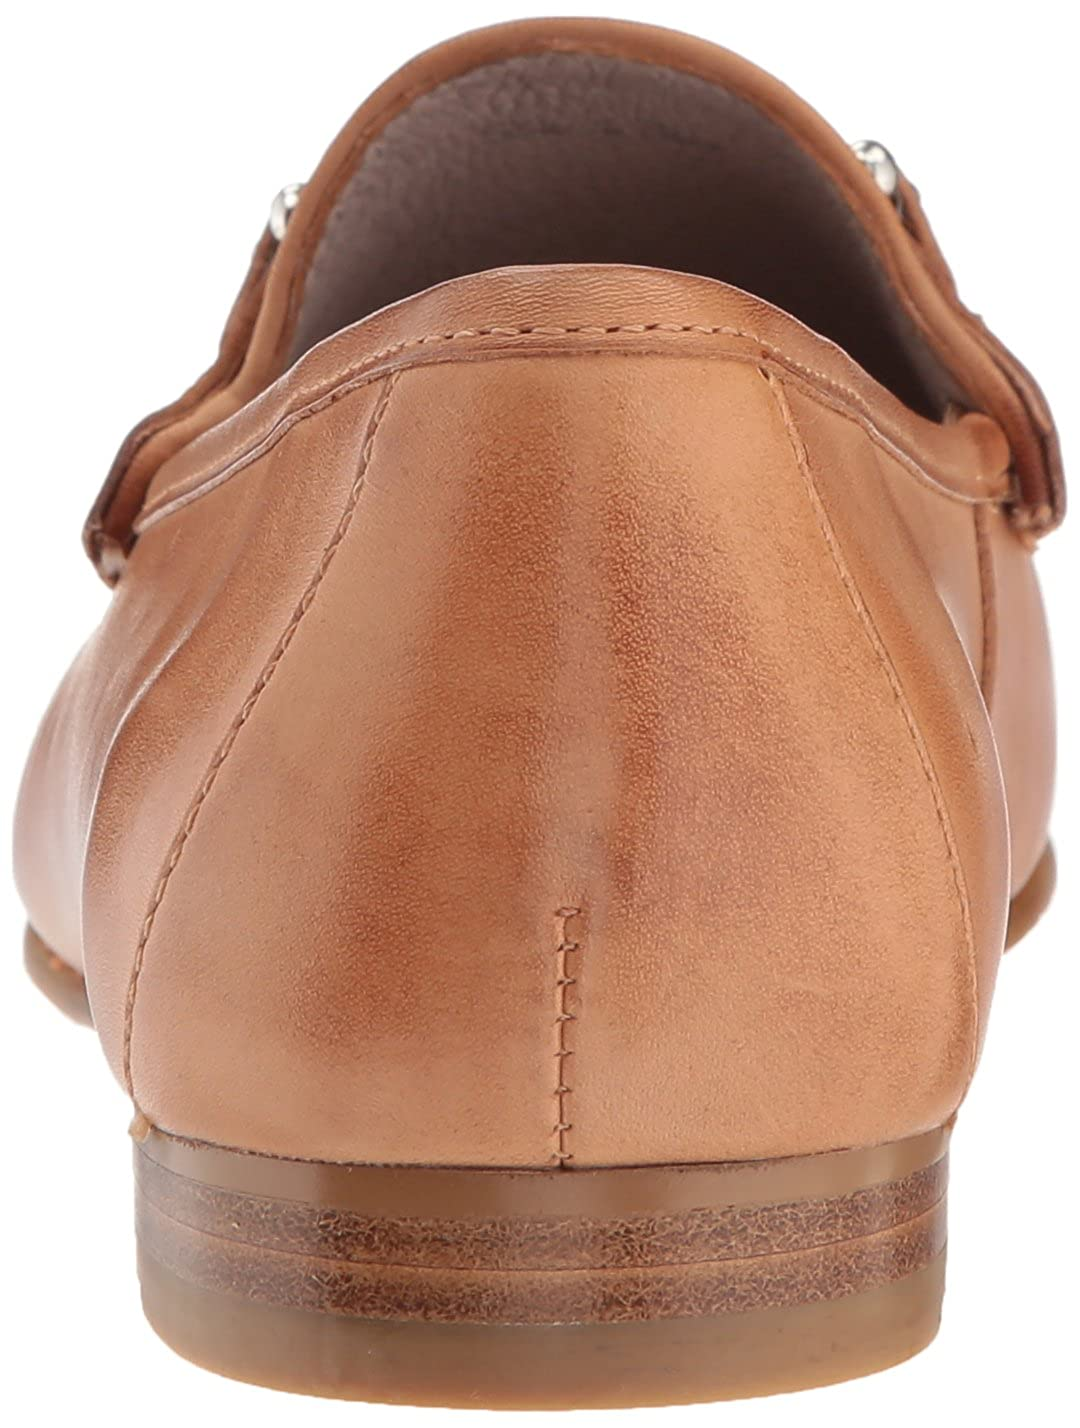 Donald J Pliner Womens Suzy Loafer Flat